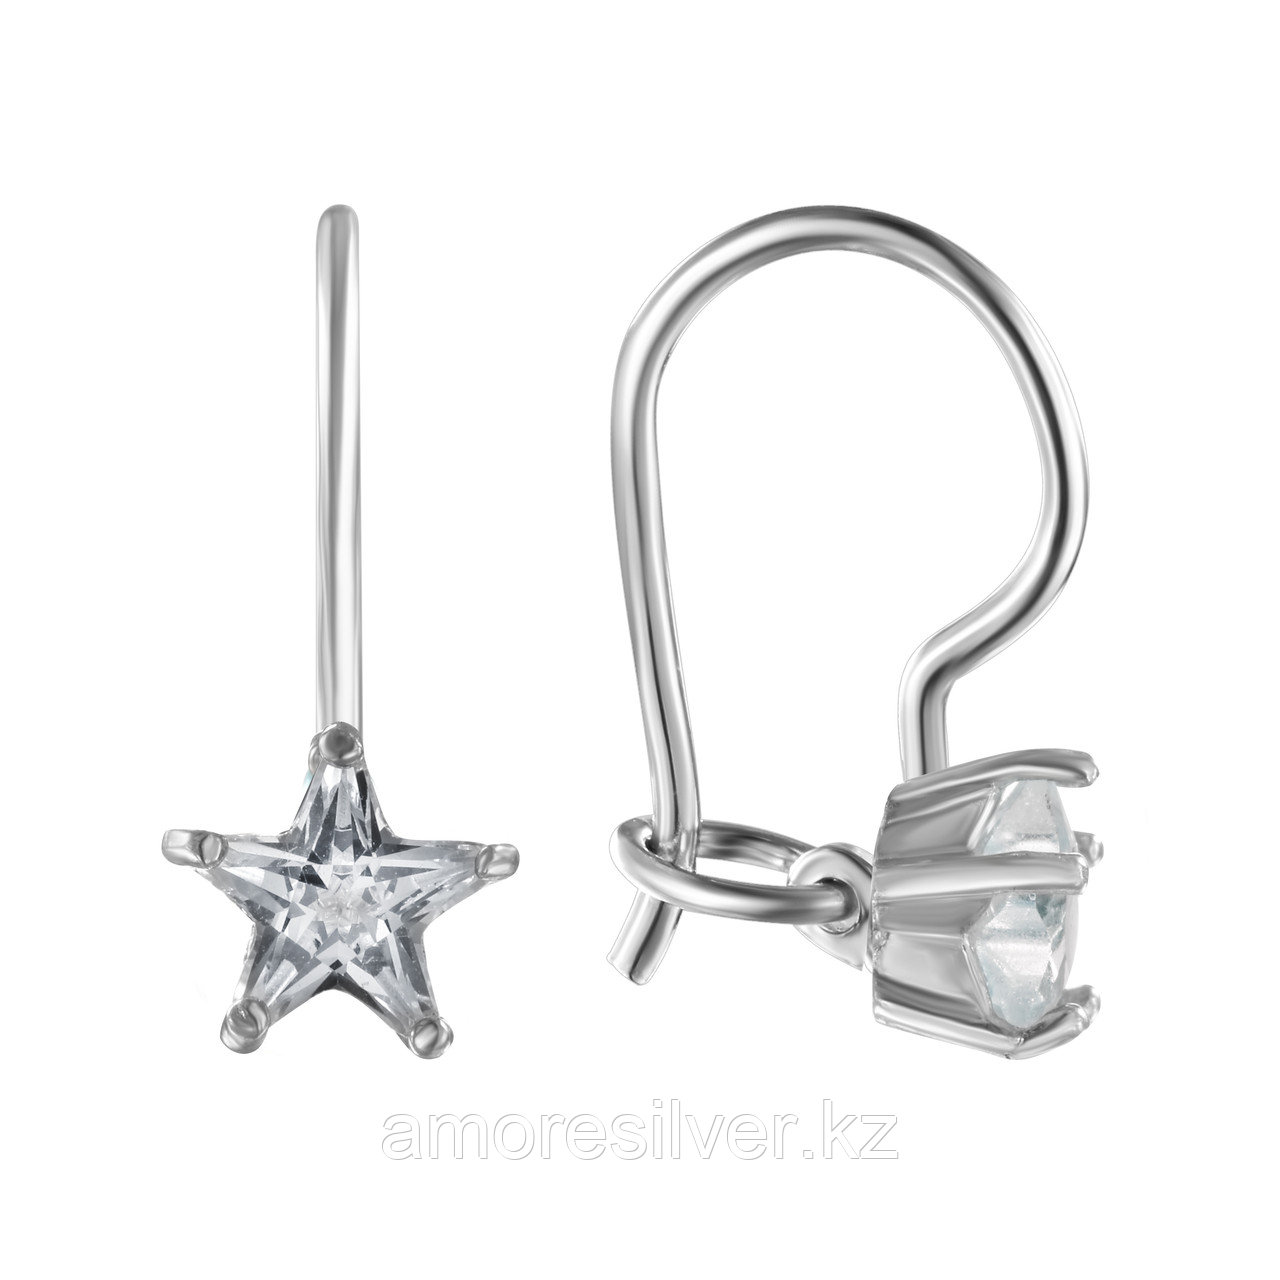 "Кольцо L-Silver серебро с родием, кварц розовый, , ""каратник"" с15-740"